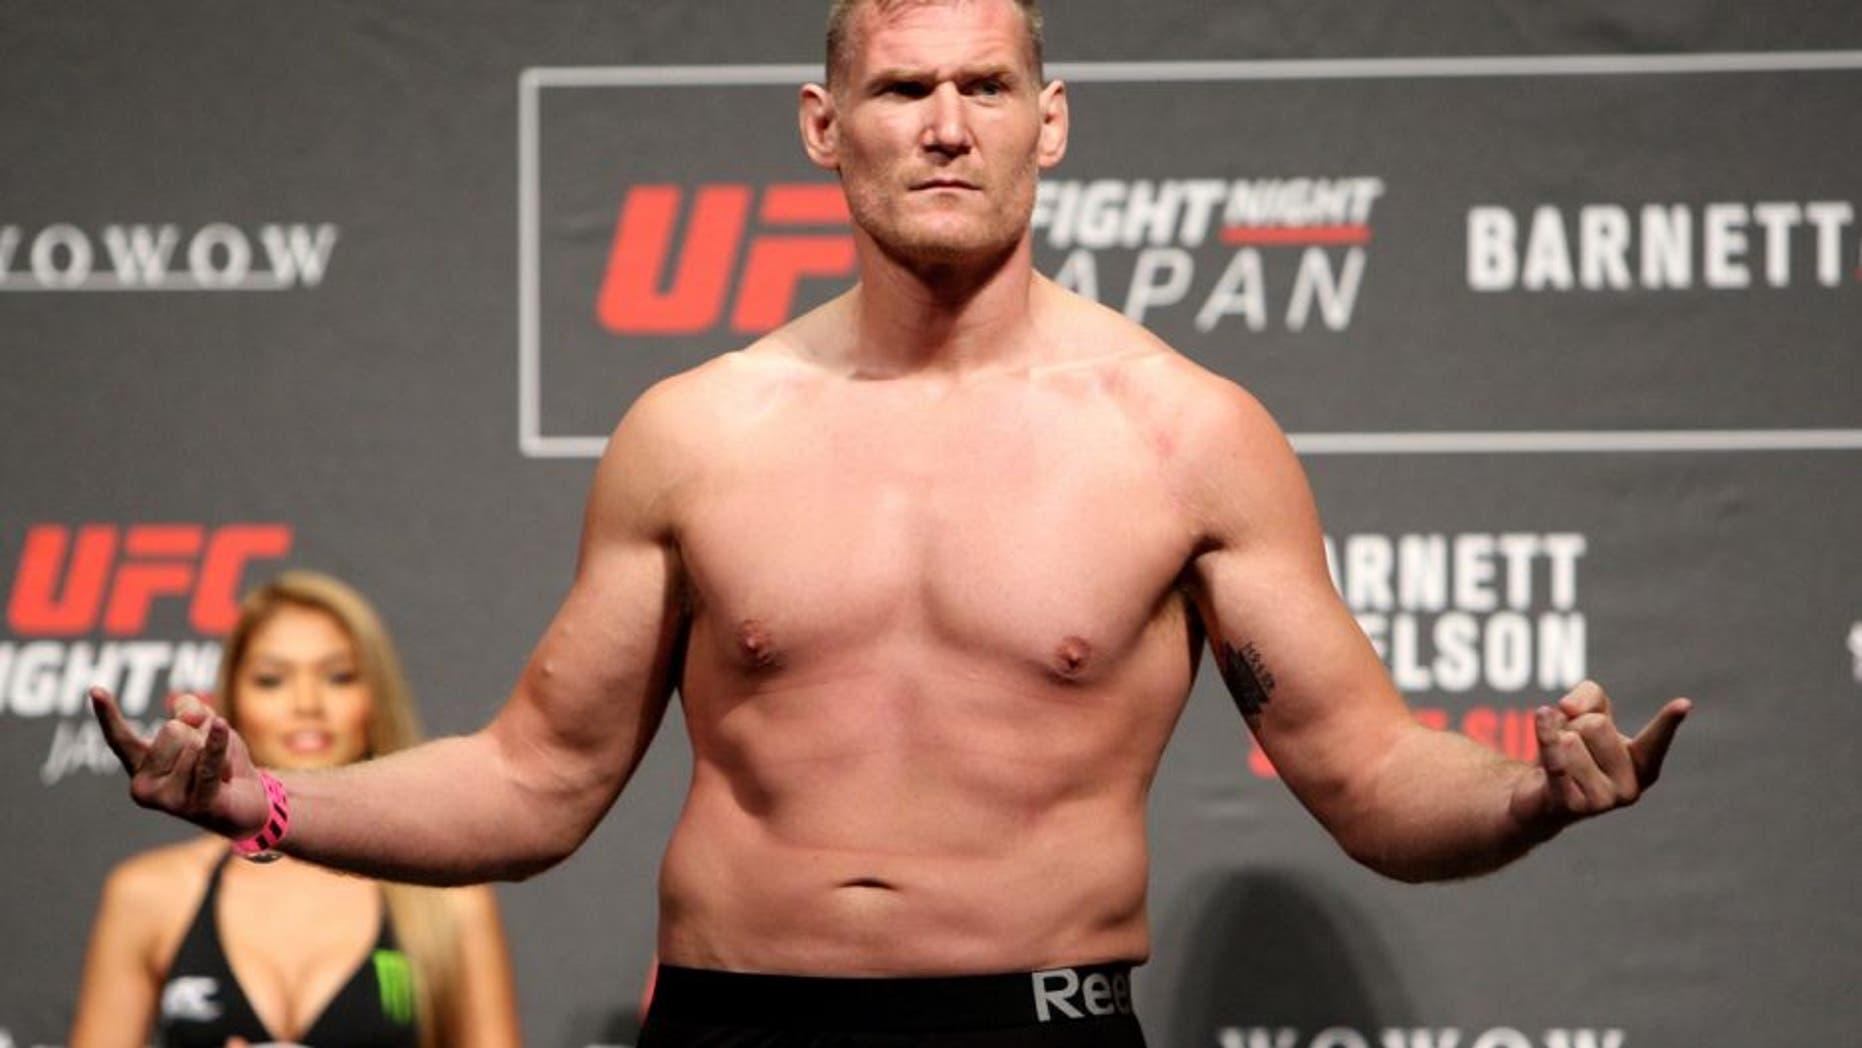 SAITAMA, JAPAN - SEPTEMBER 25: Josh Barnett during the UFC weigh-in at the Saitama Super Arena on September 25, 2015 in Saitama, Japan. (Photo by Mitch Viquez/Zuffa LLC/Zuffa LLC via Getty Images)